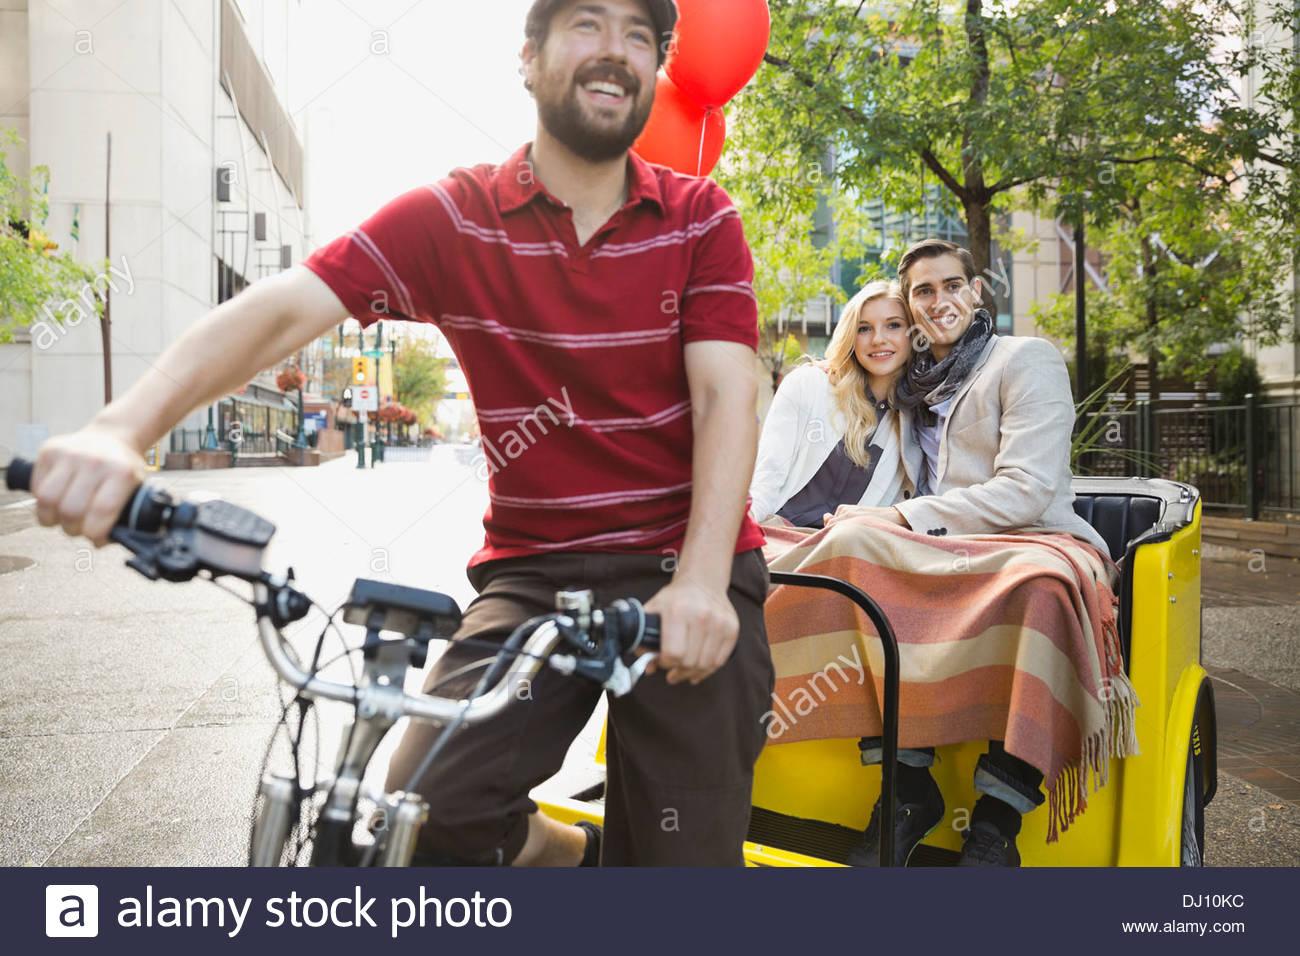 Rickshaw driver and couple on city street - Stock Image